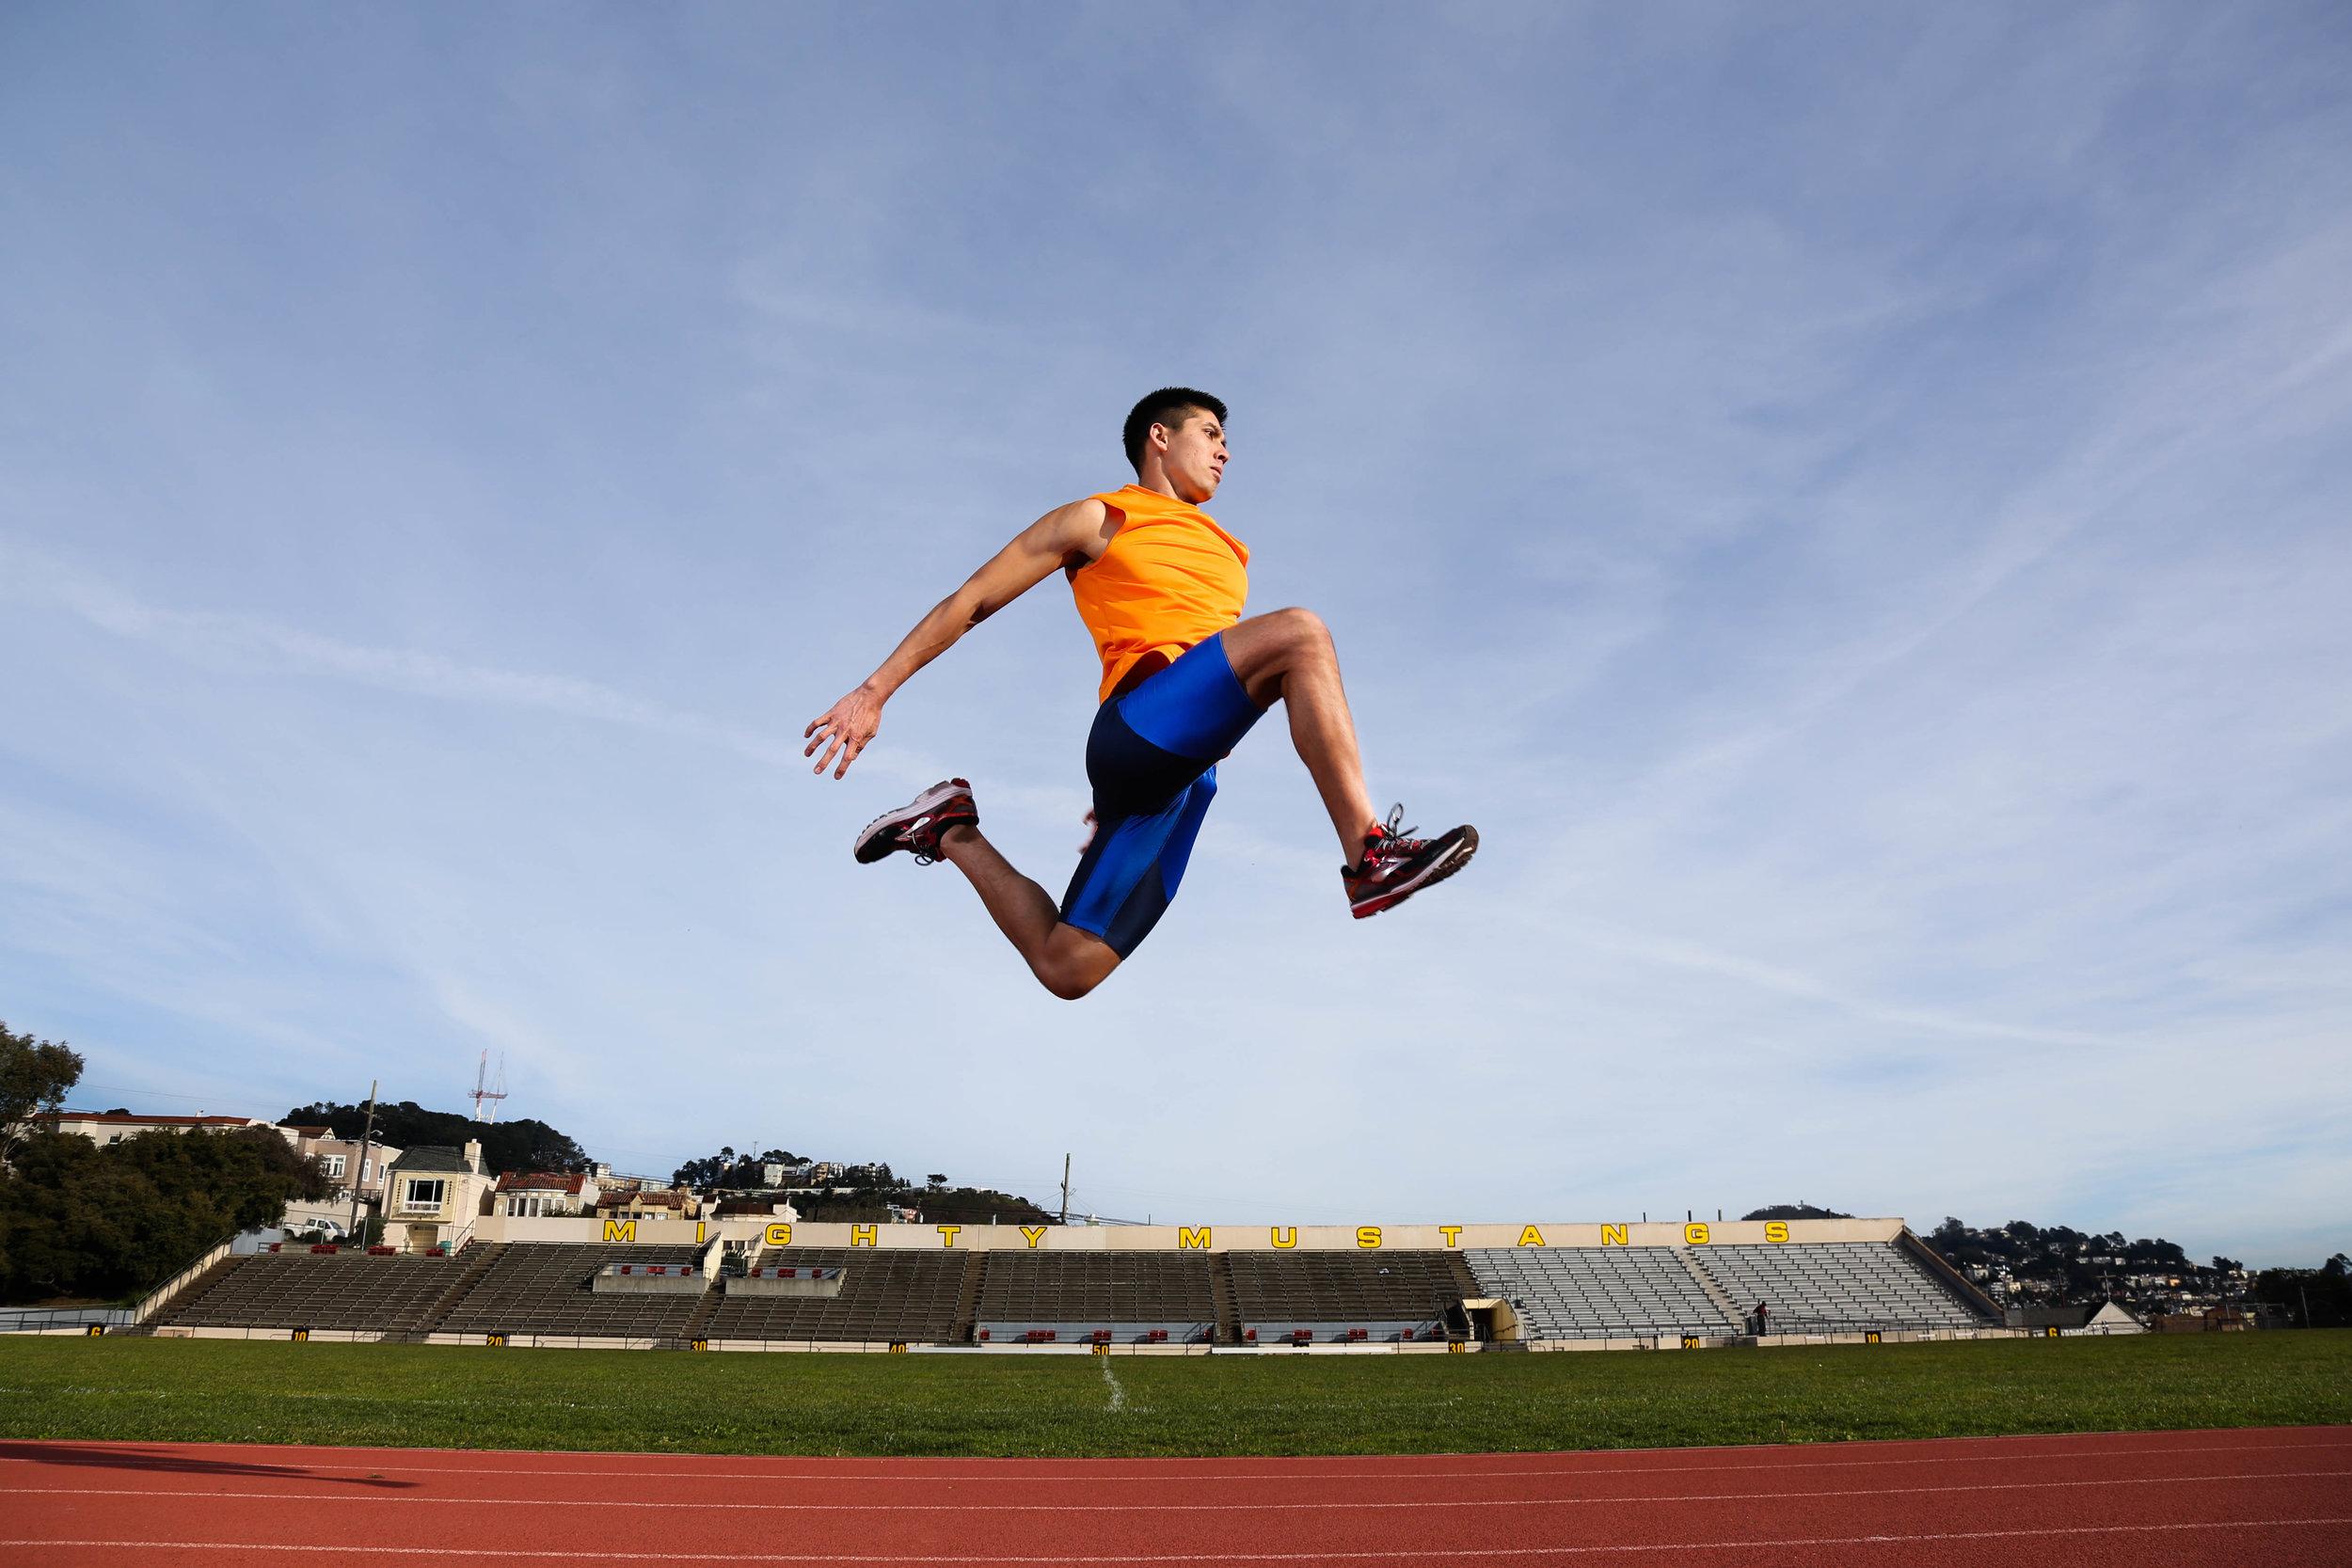 andrew jump no vign.jpg